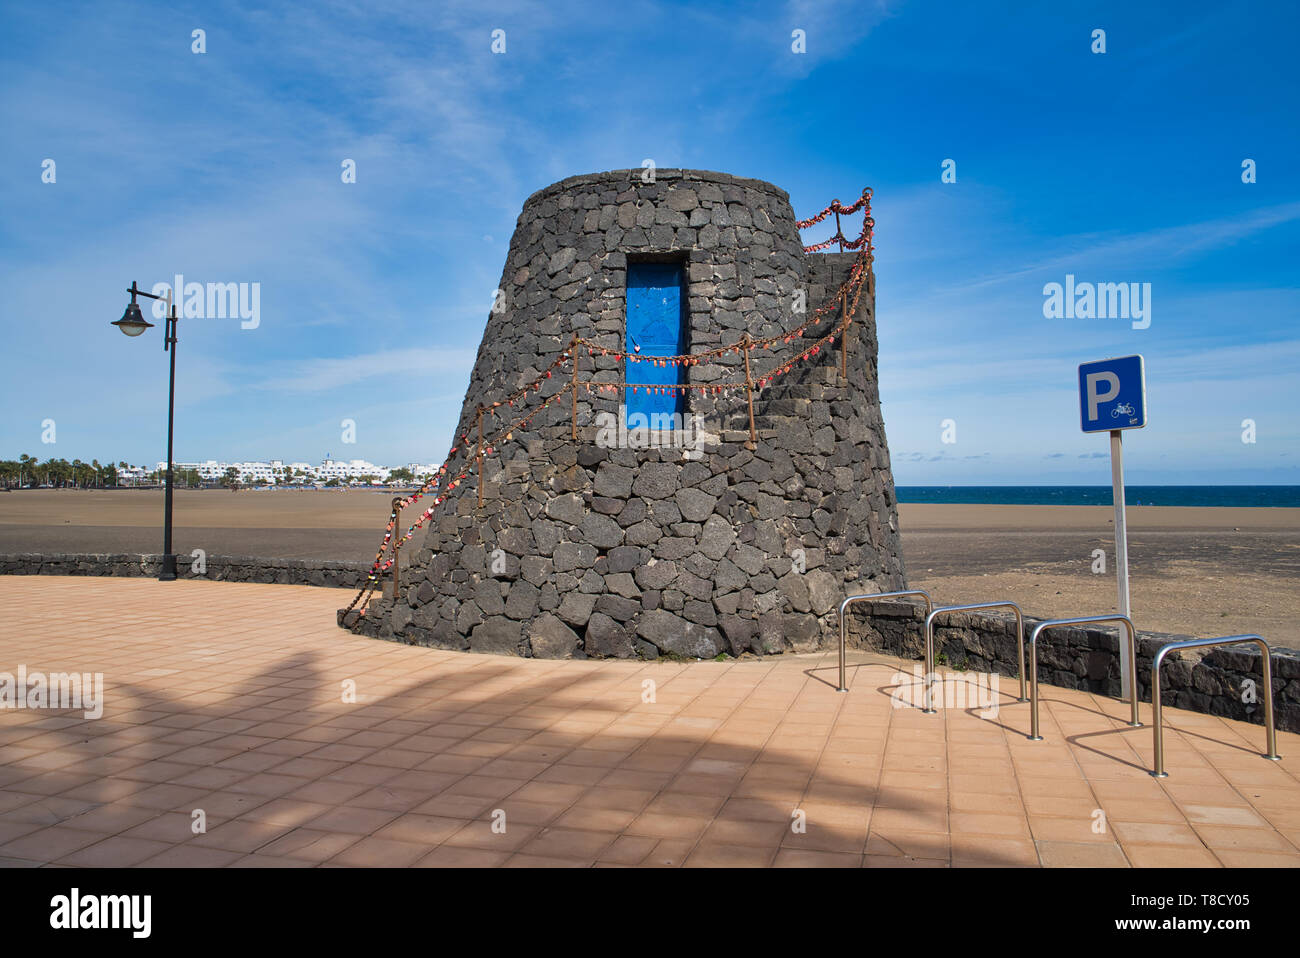 Tower of black lava stones, blue door and love locks on Promenade of